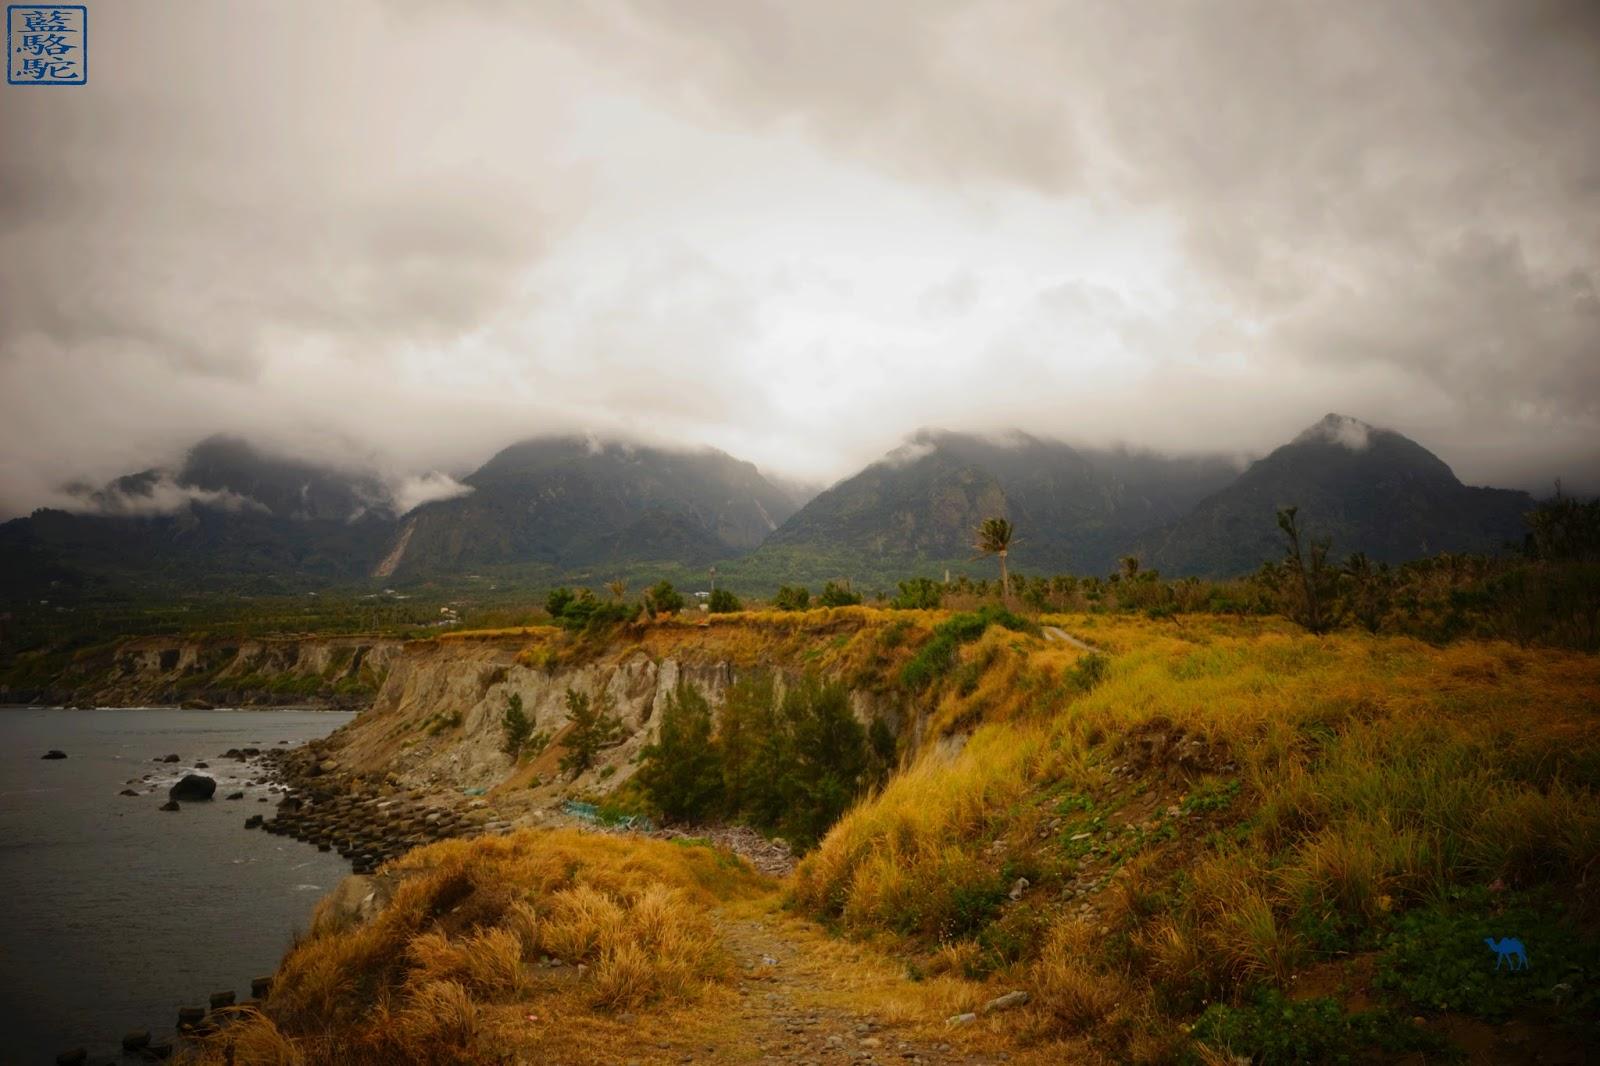 Le Chameau Bleu - Blog Voyage Taitung Taiwan - Cotes de Taitung - Promenade à faire à taiwan